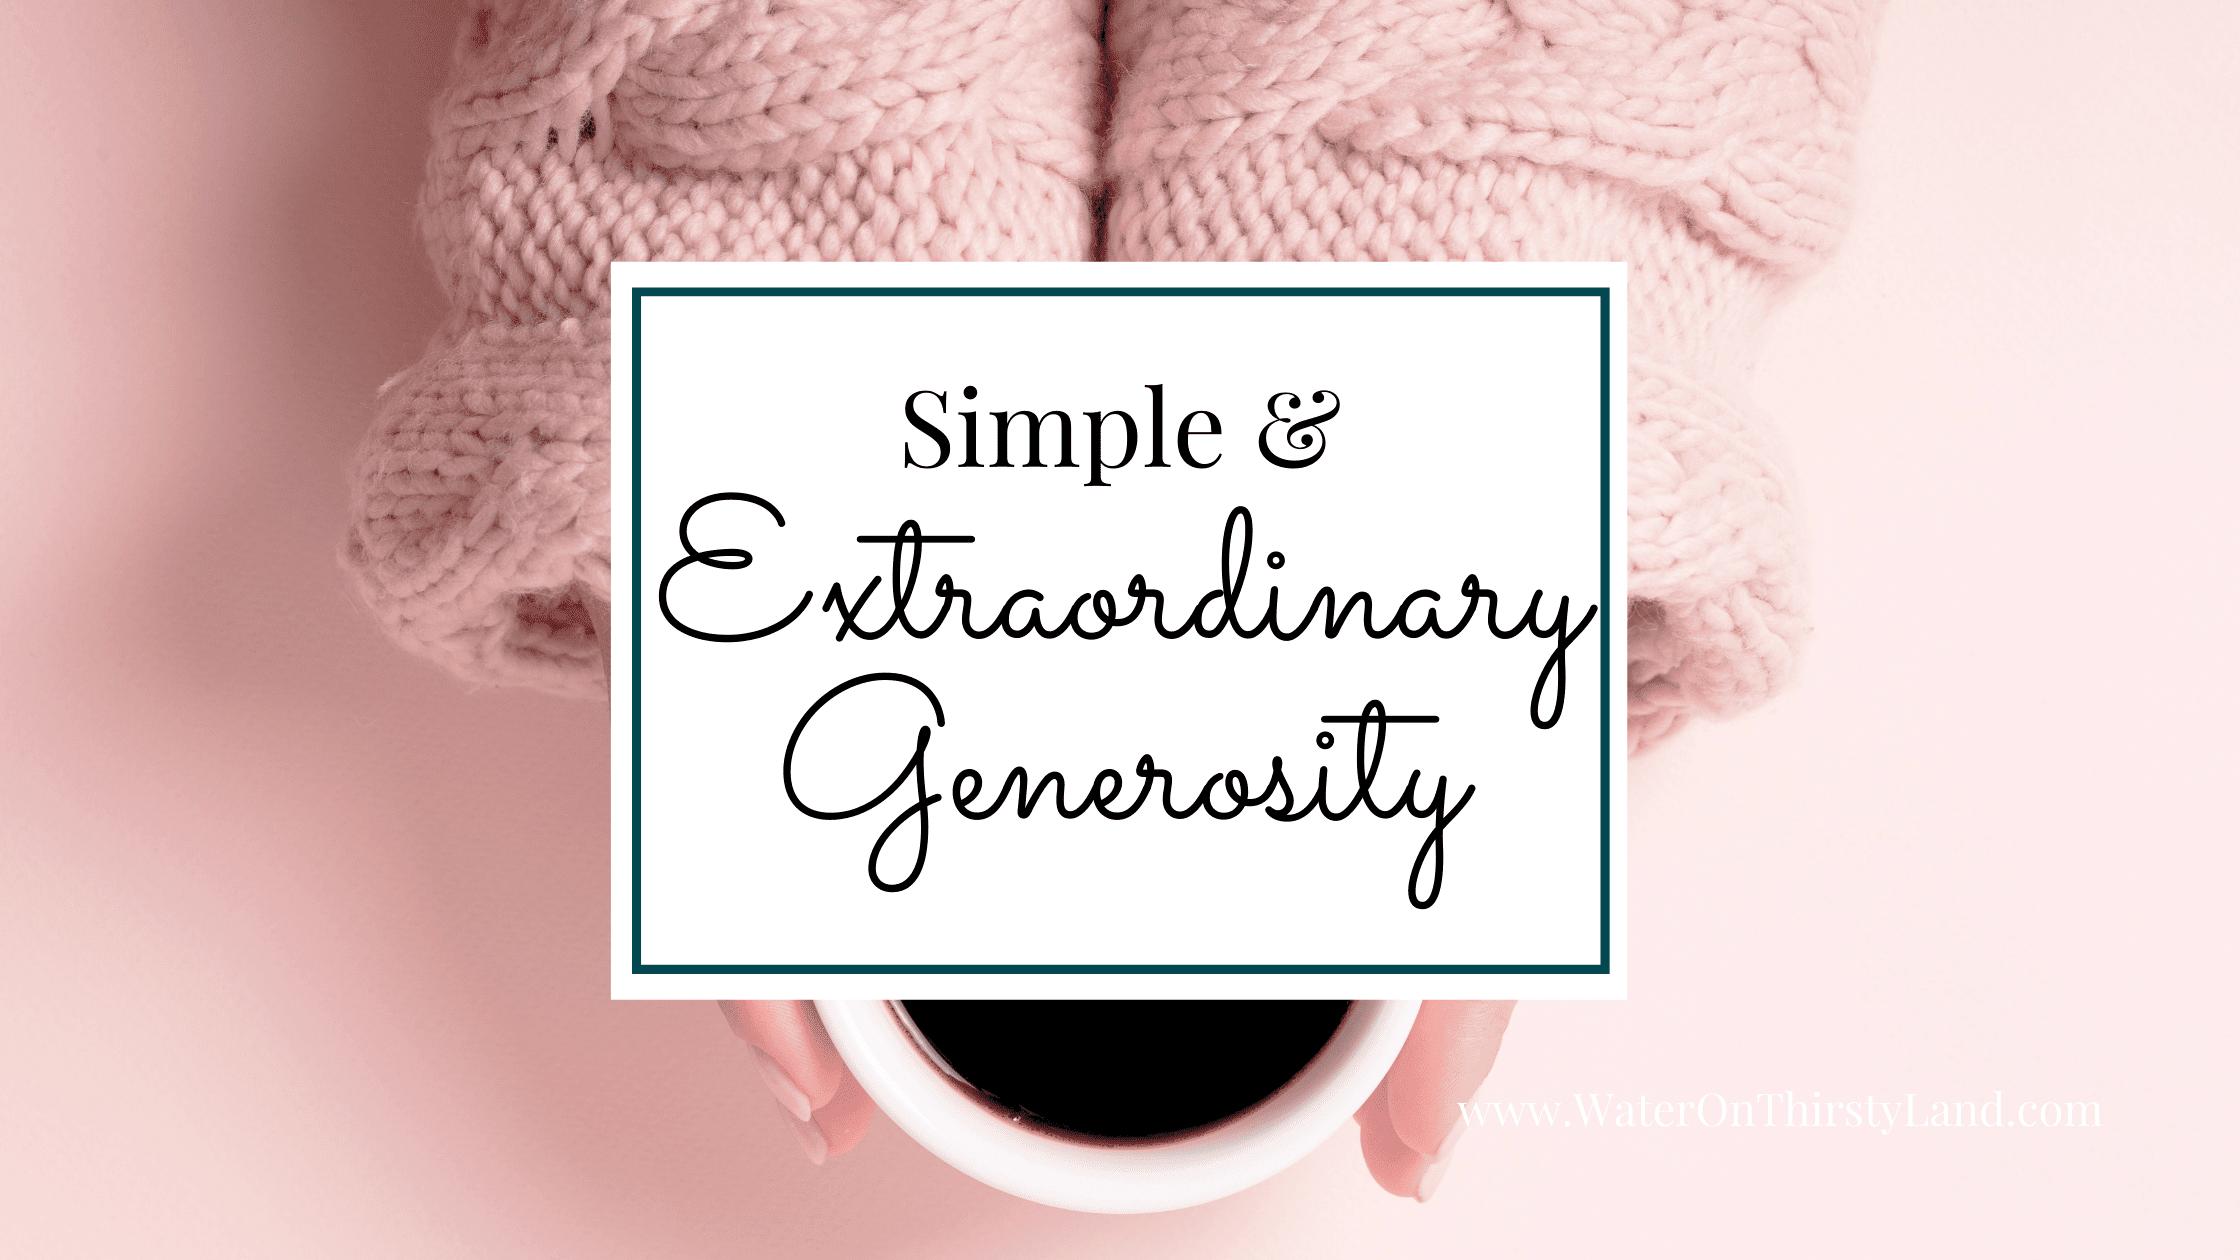 Simple & Extraordinary Generosity